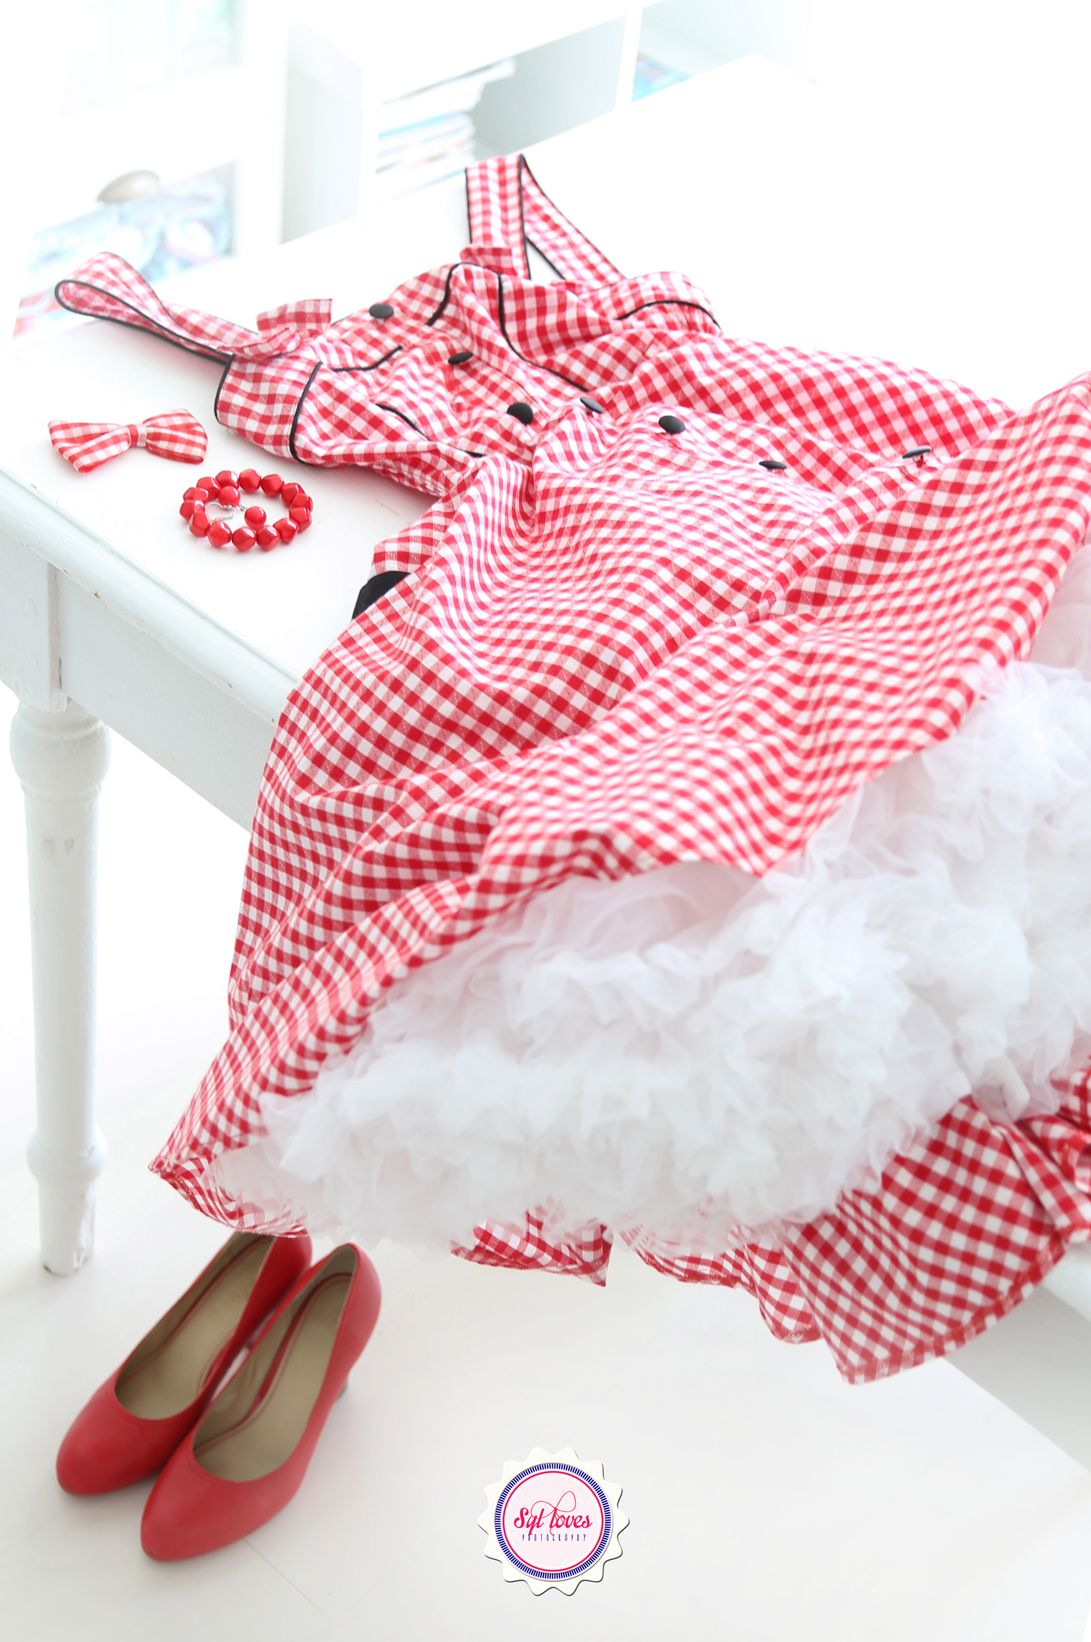 Syl loves, retro dress, gingham | Vintage | Pinterest | Mi estilo ...